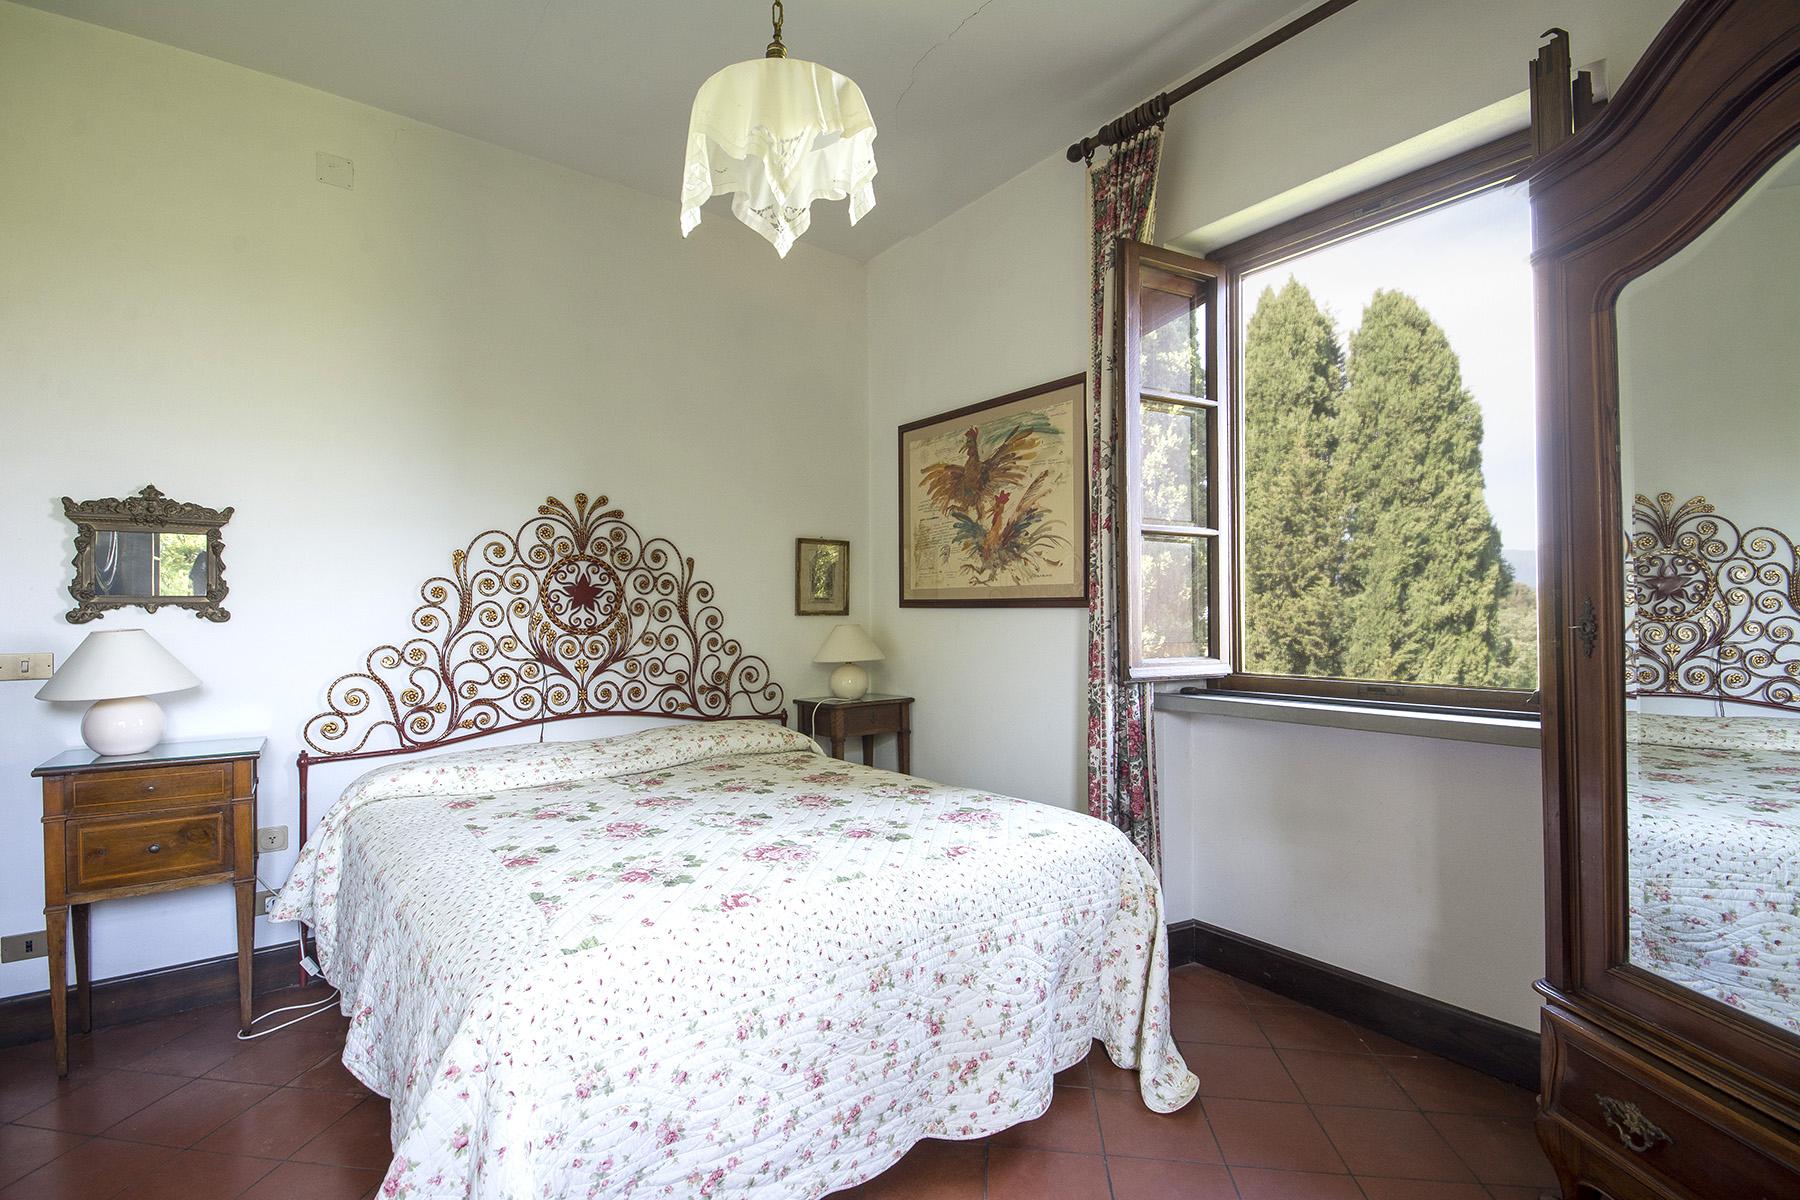 Villa in Vendita a Lucca: 5 locali, 600 mq - Foto 22